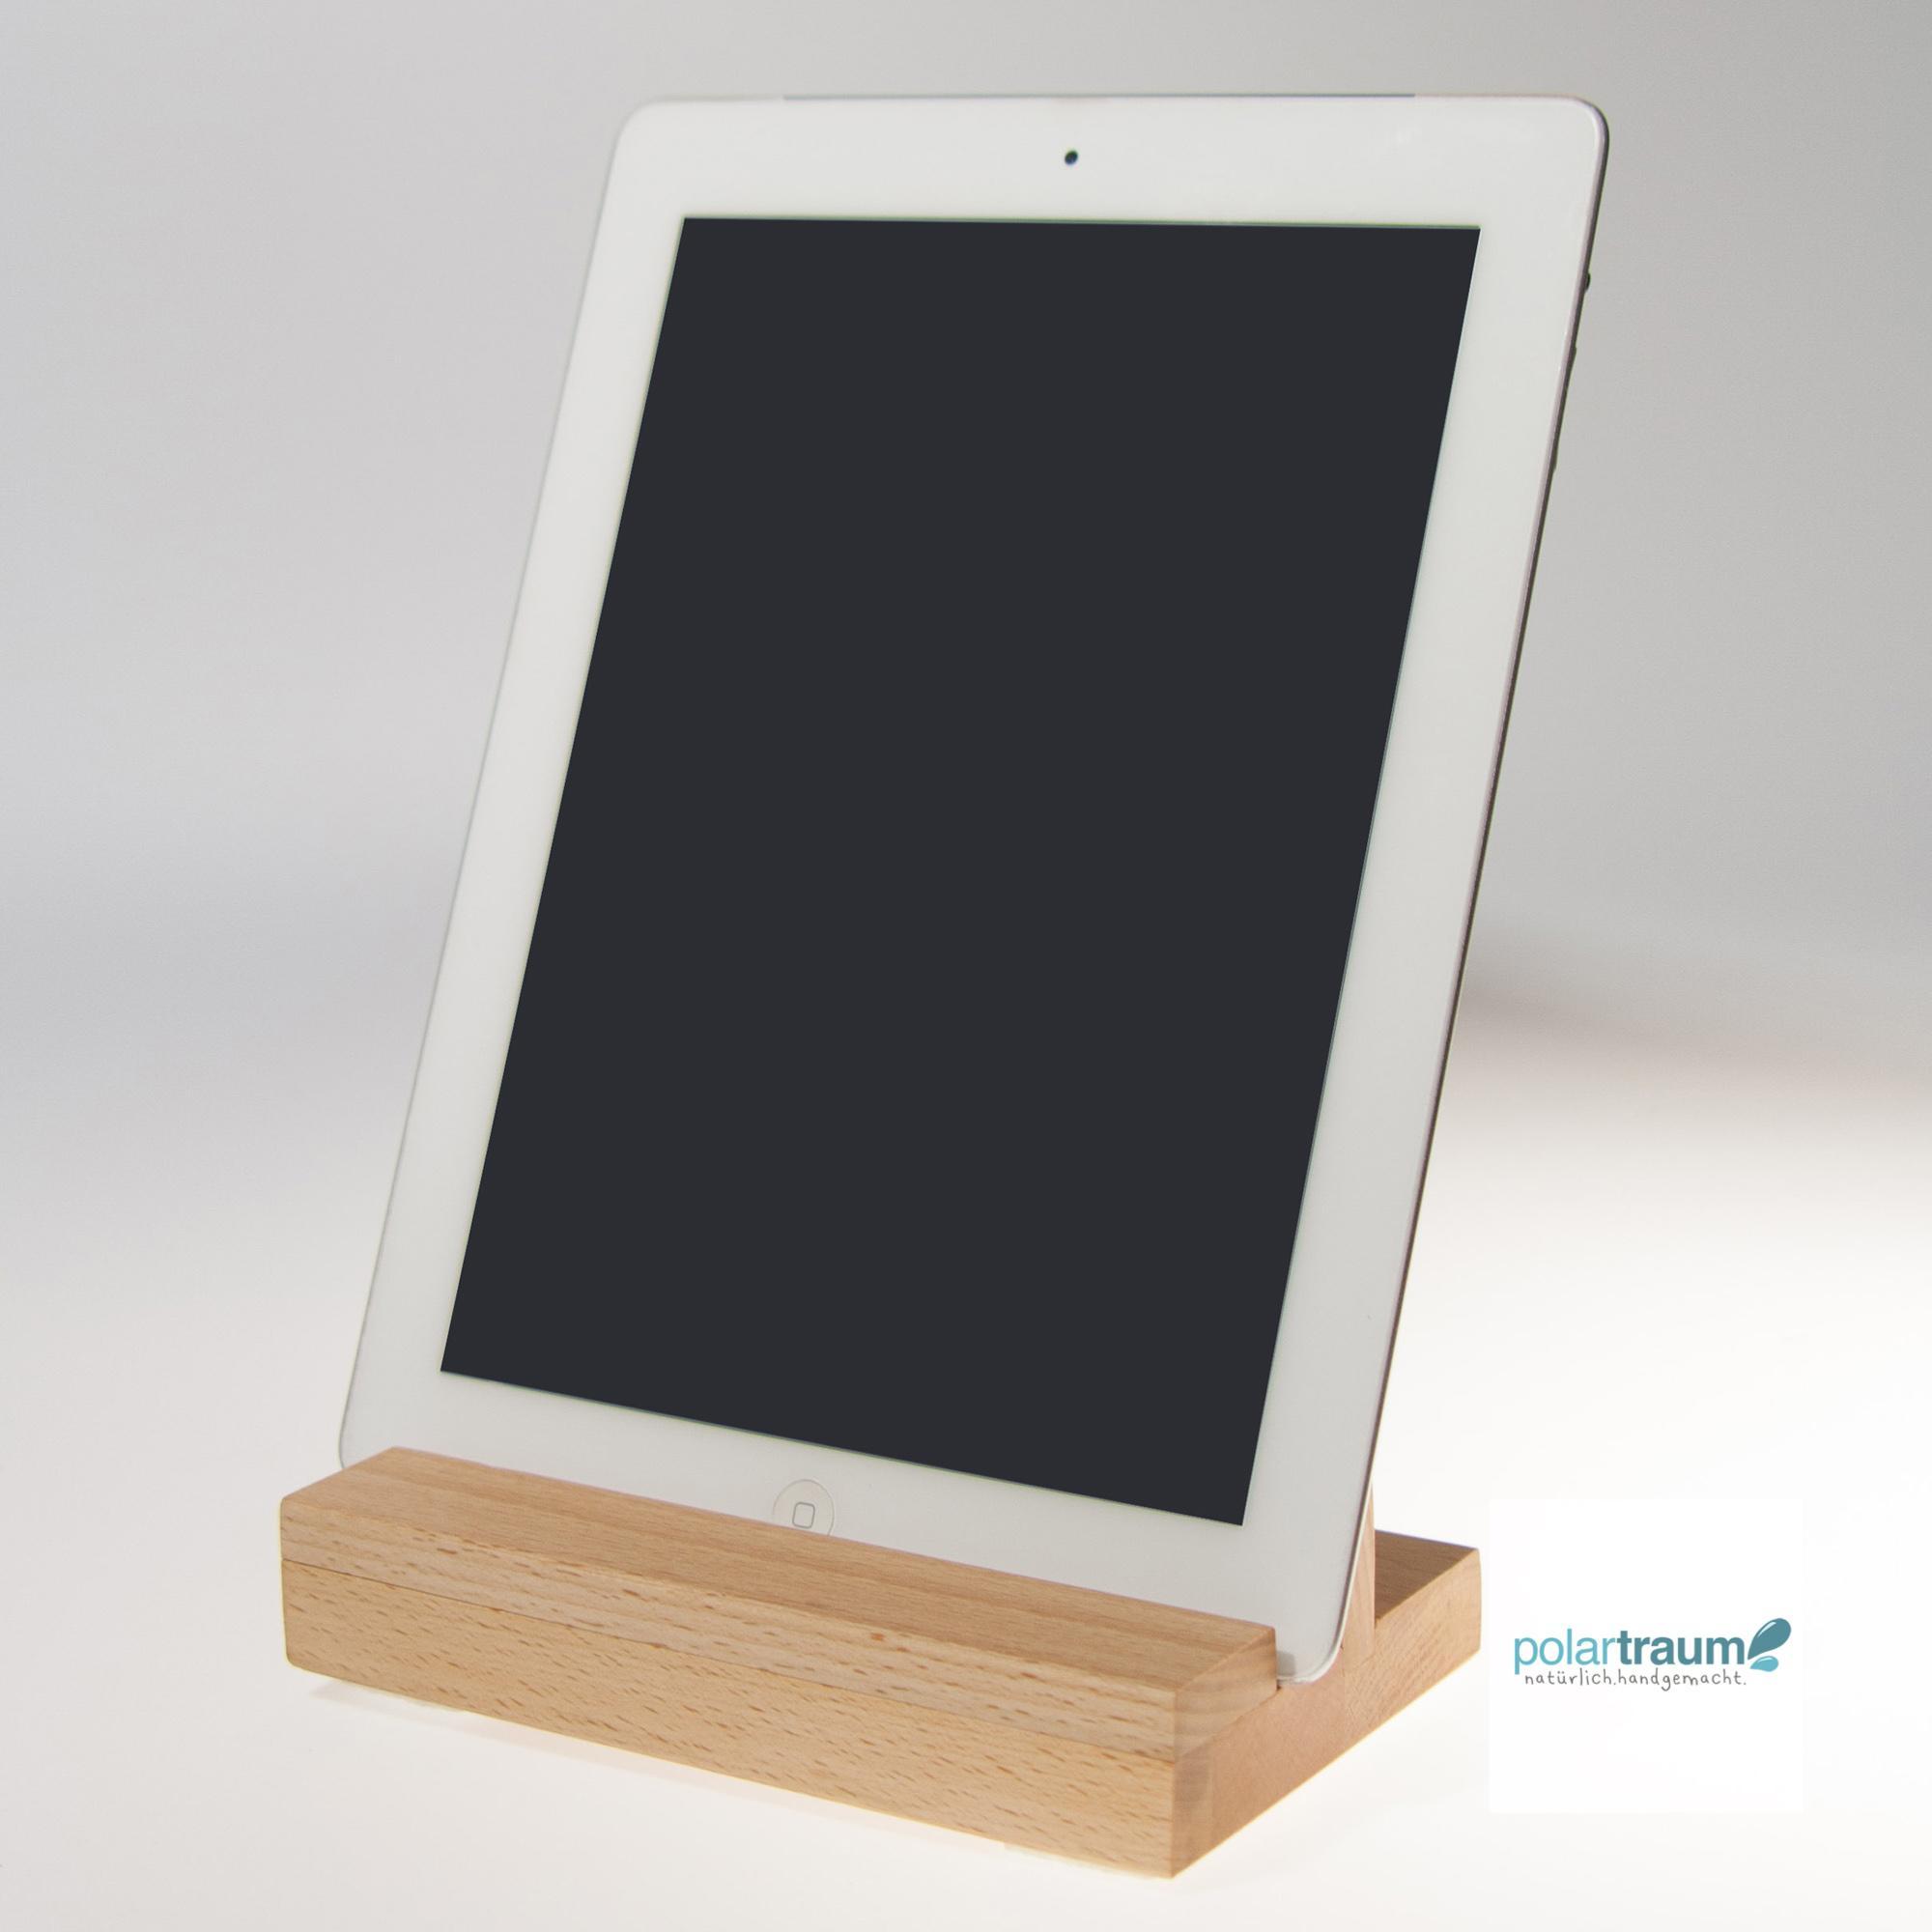 tablet ipad st nder aus fsc buche polartraum. Black Bedroom Furniture Sets. Home Design Ideas